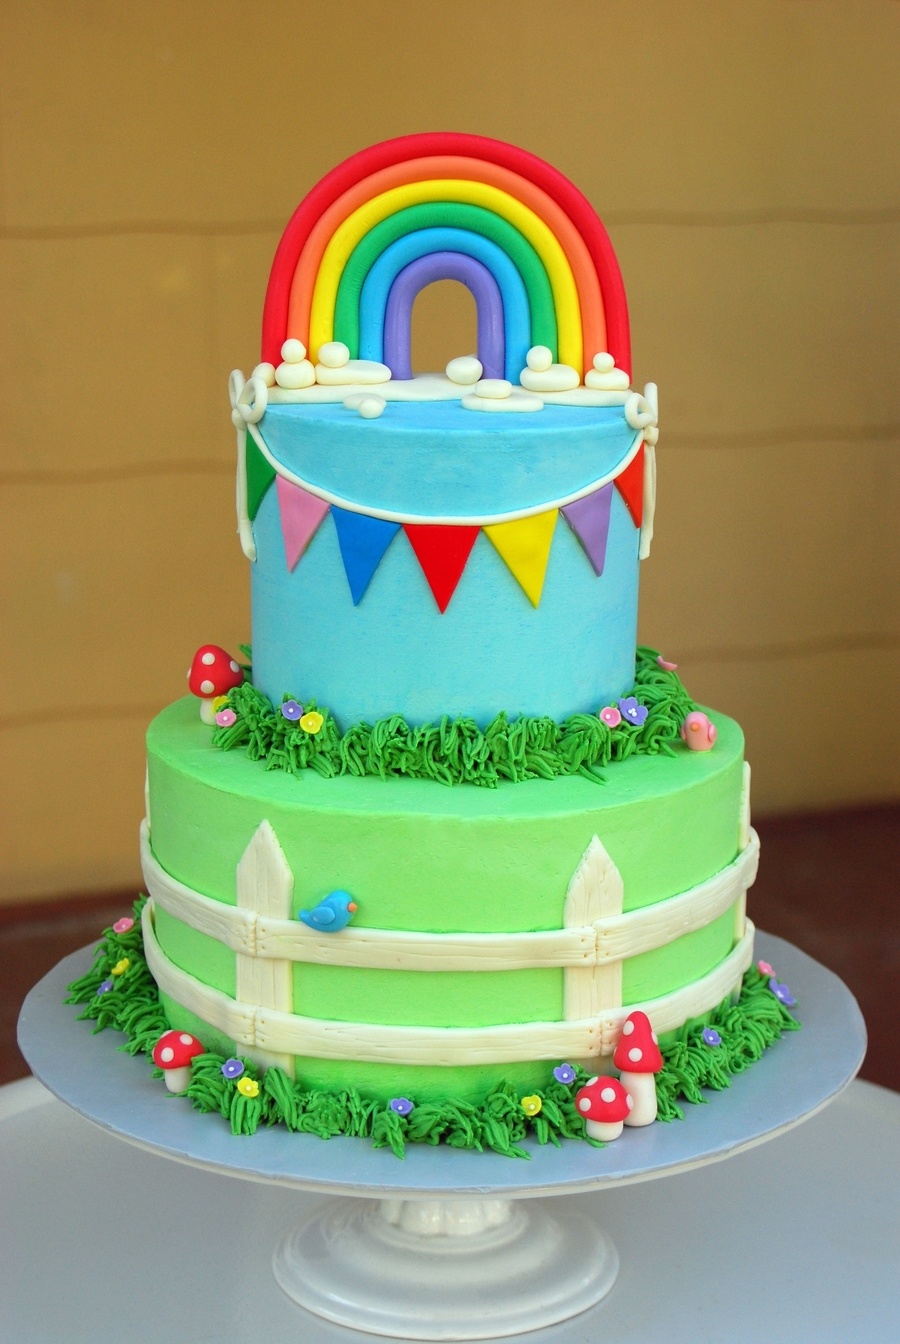 Rainbow Decorated Cakes